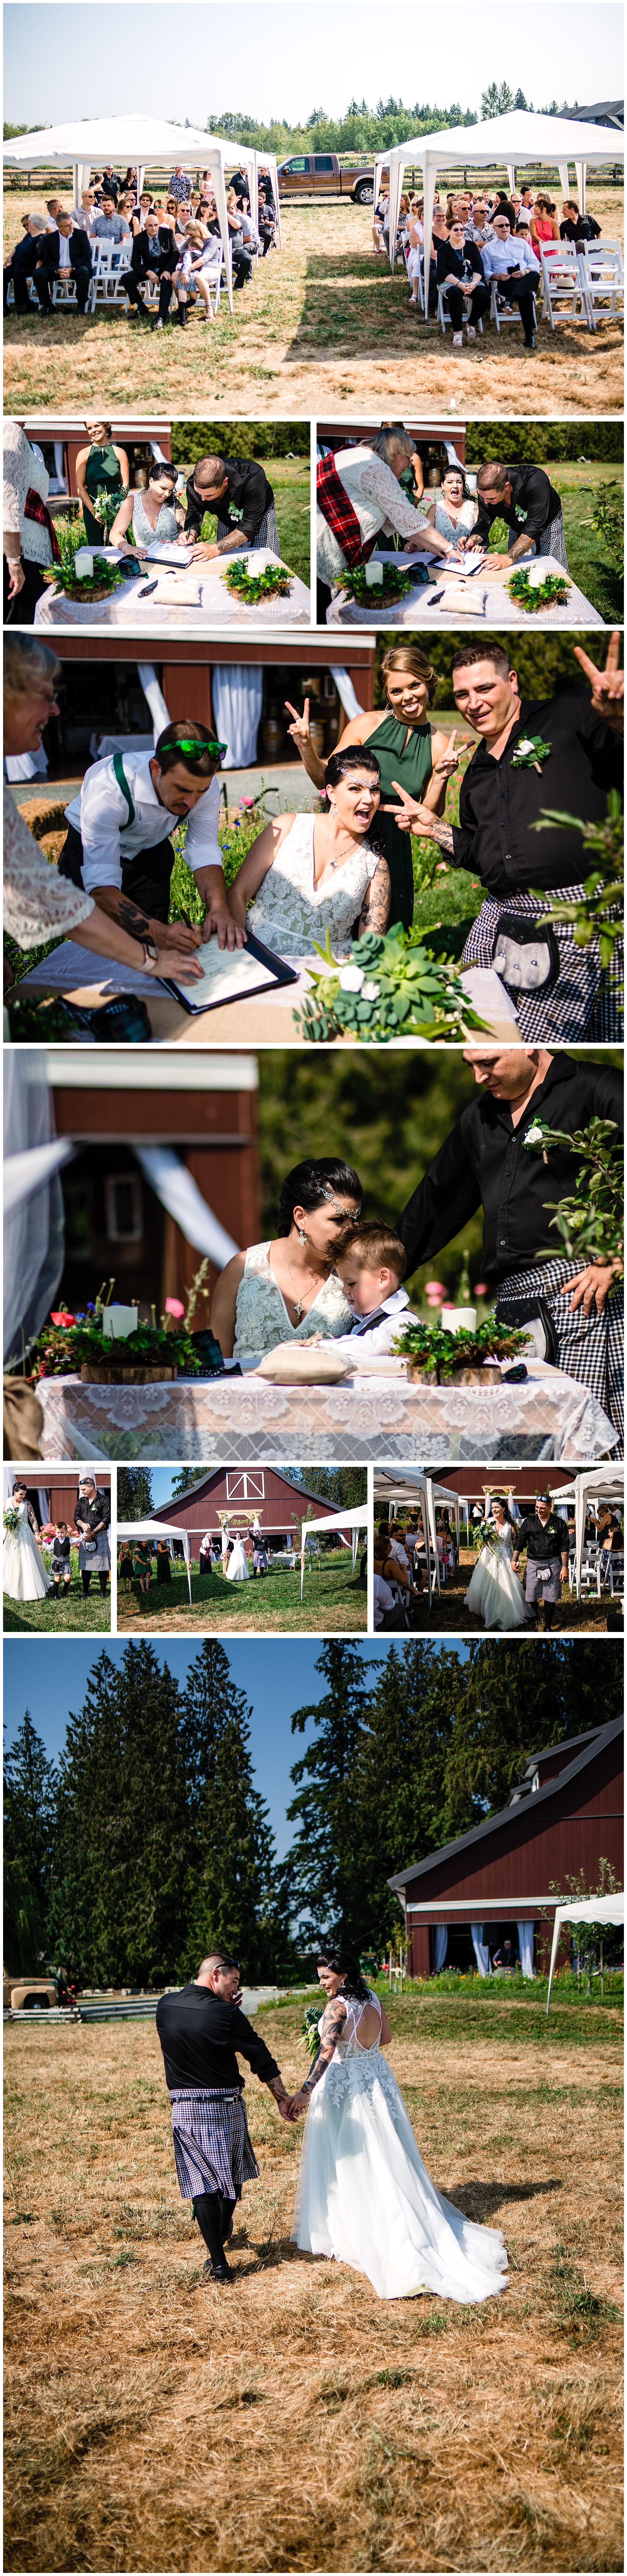 White-Owl-Barn-langley-bc-wedding-photographer-rustic-bbq-foodtruck-scottish-emerald-green-drinks_0003.jpg